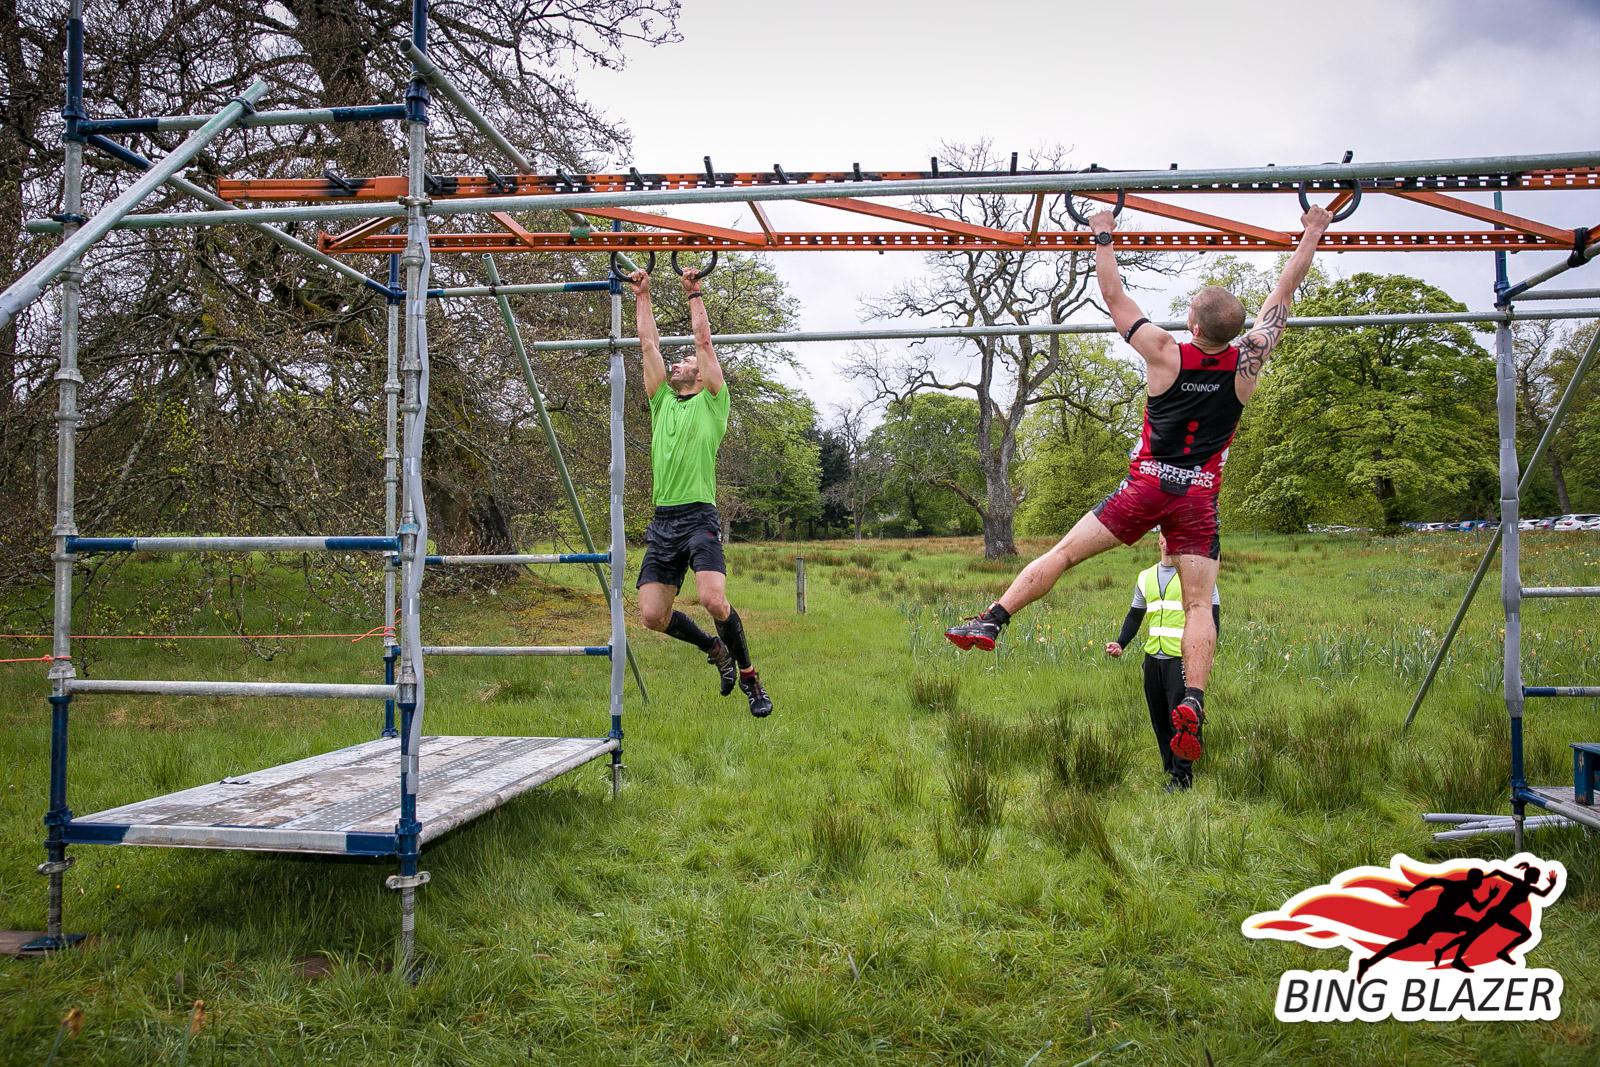 Bing-Blazer-sports-photography-edinburgh-glasgow-4.jpg